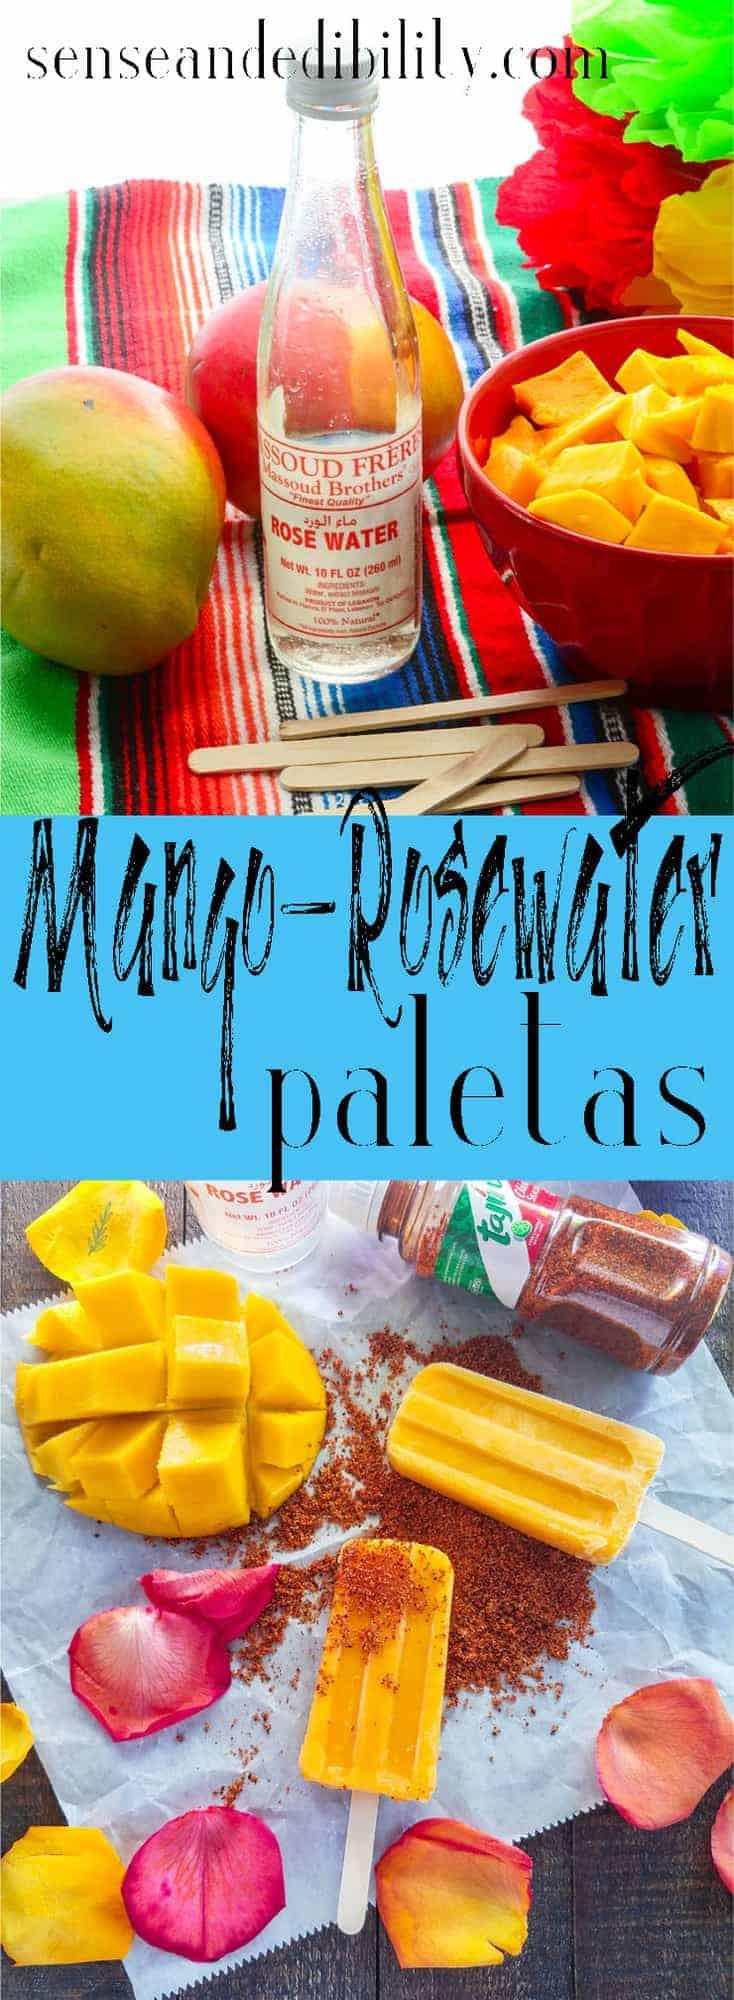 Sense & Edibility's Mango-Rosewater Paletas Pin